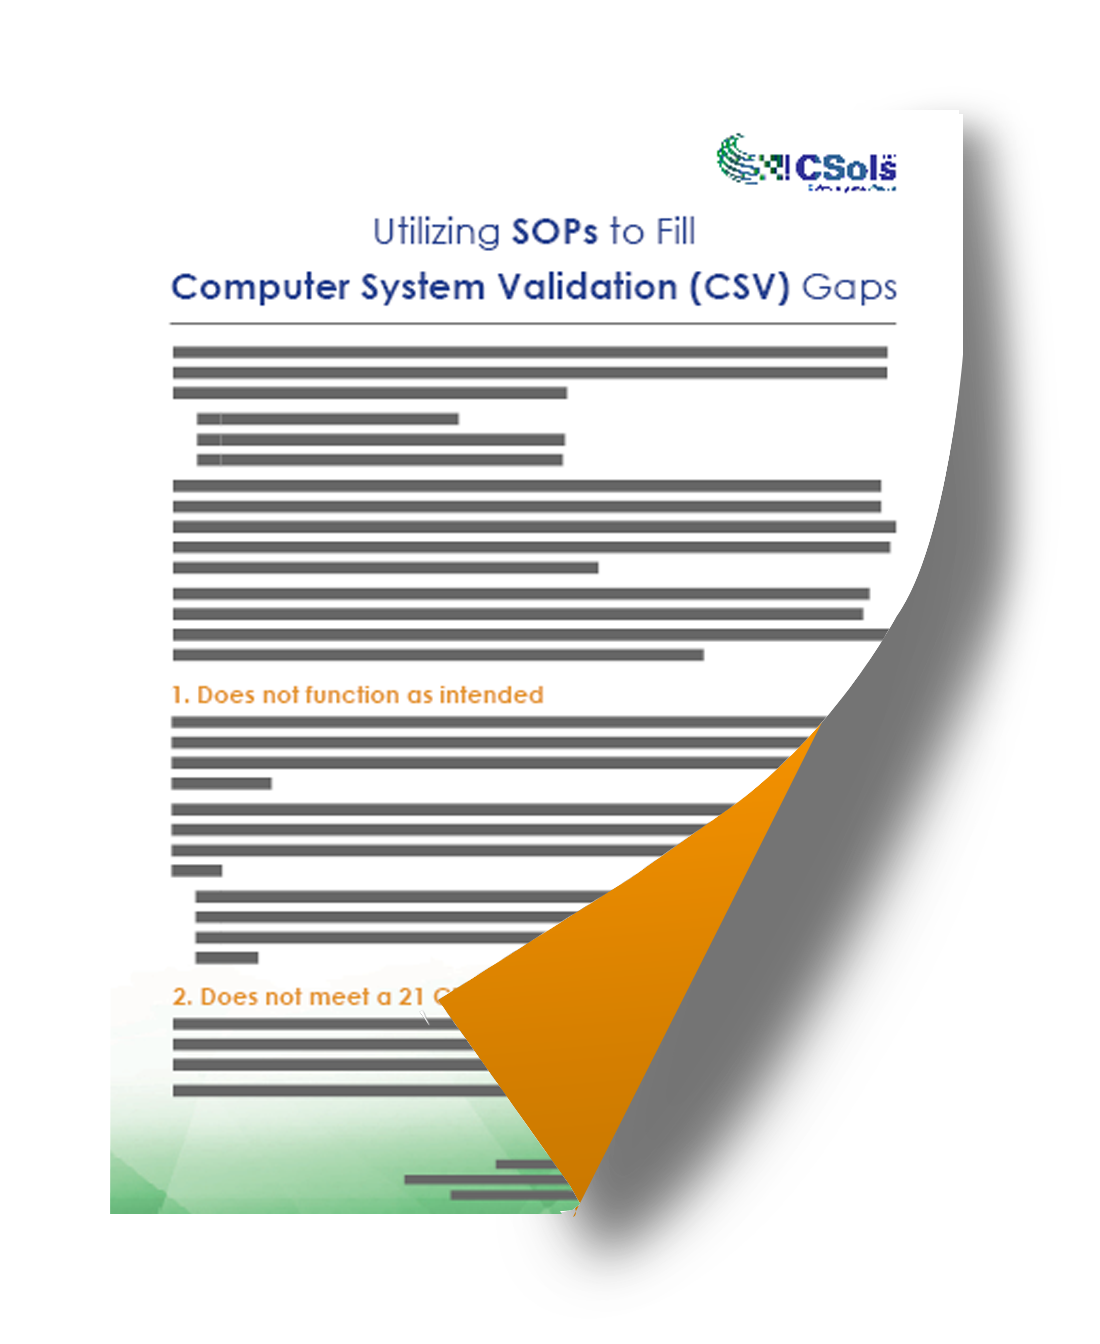 utilizing sops to fill computer system validation gaps